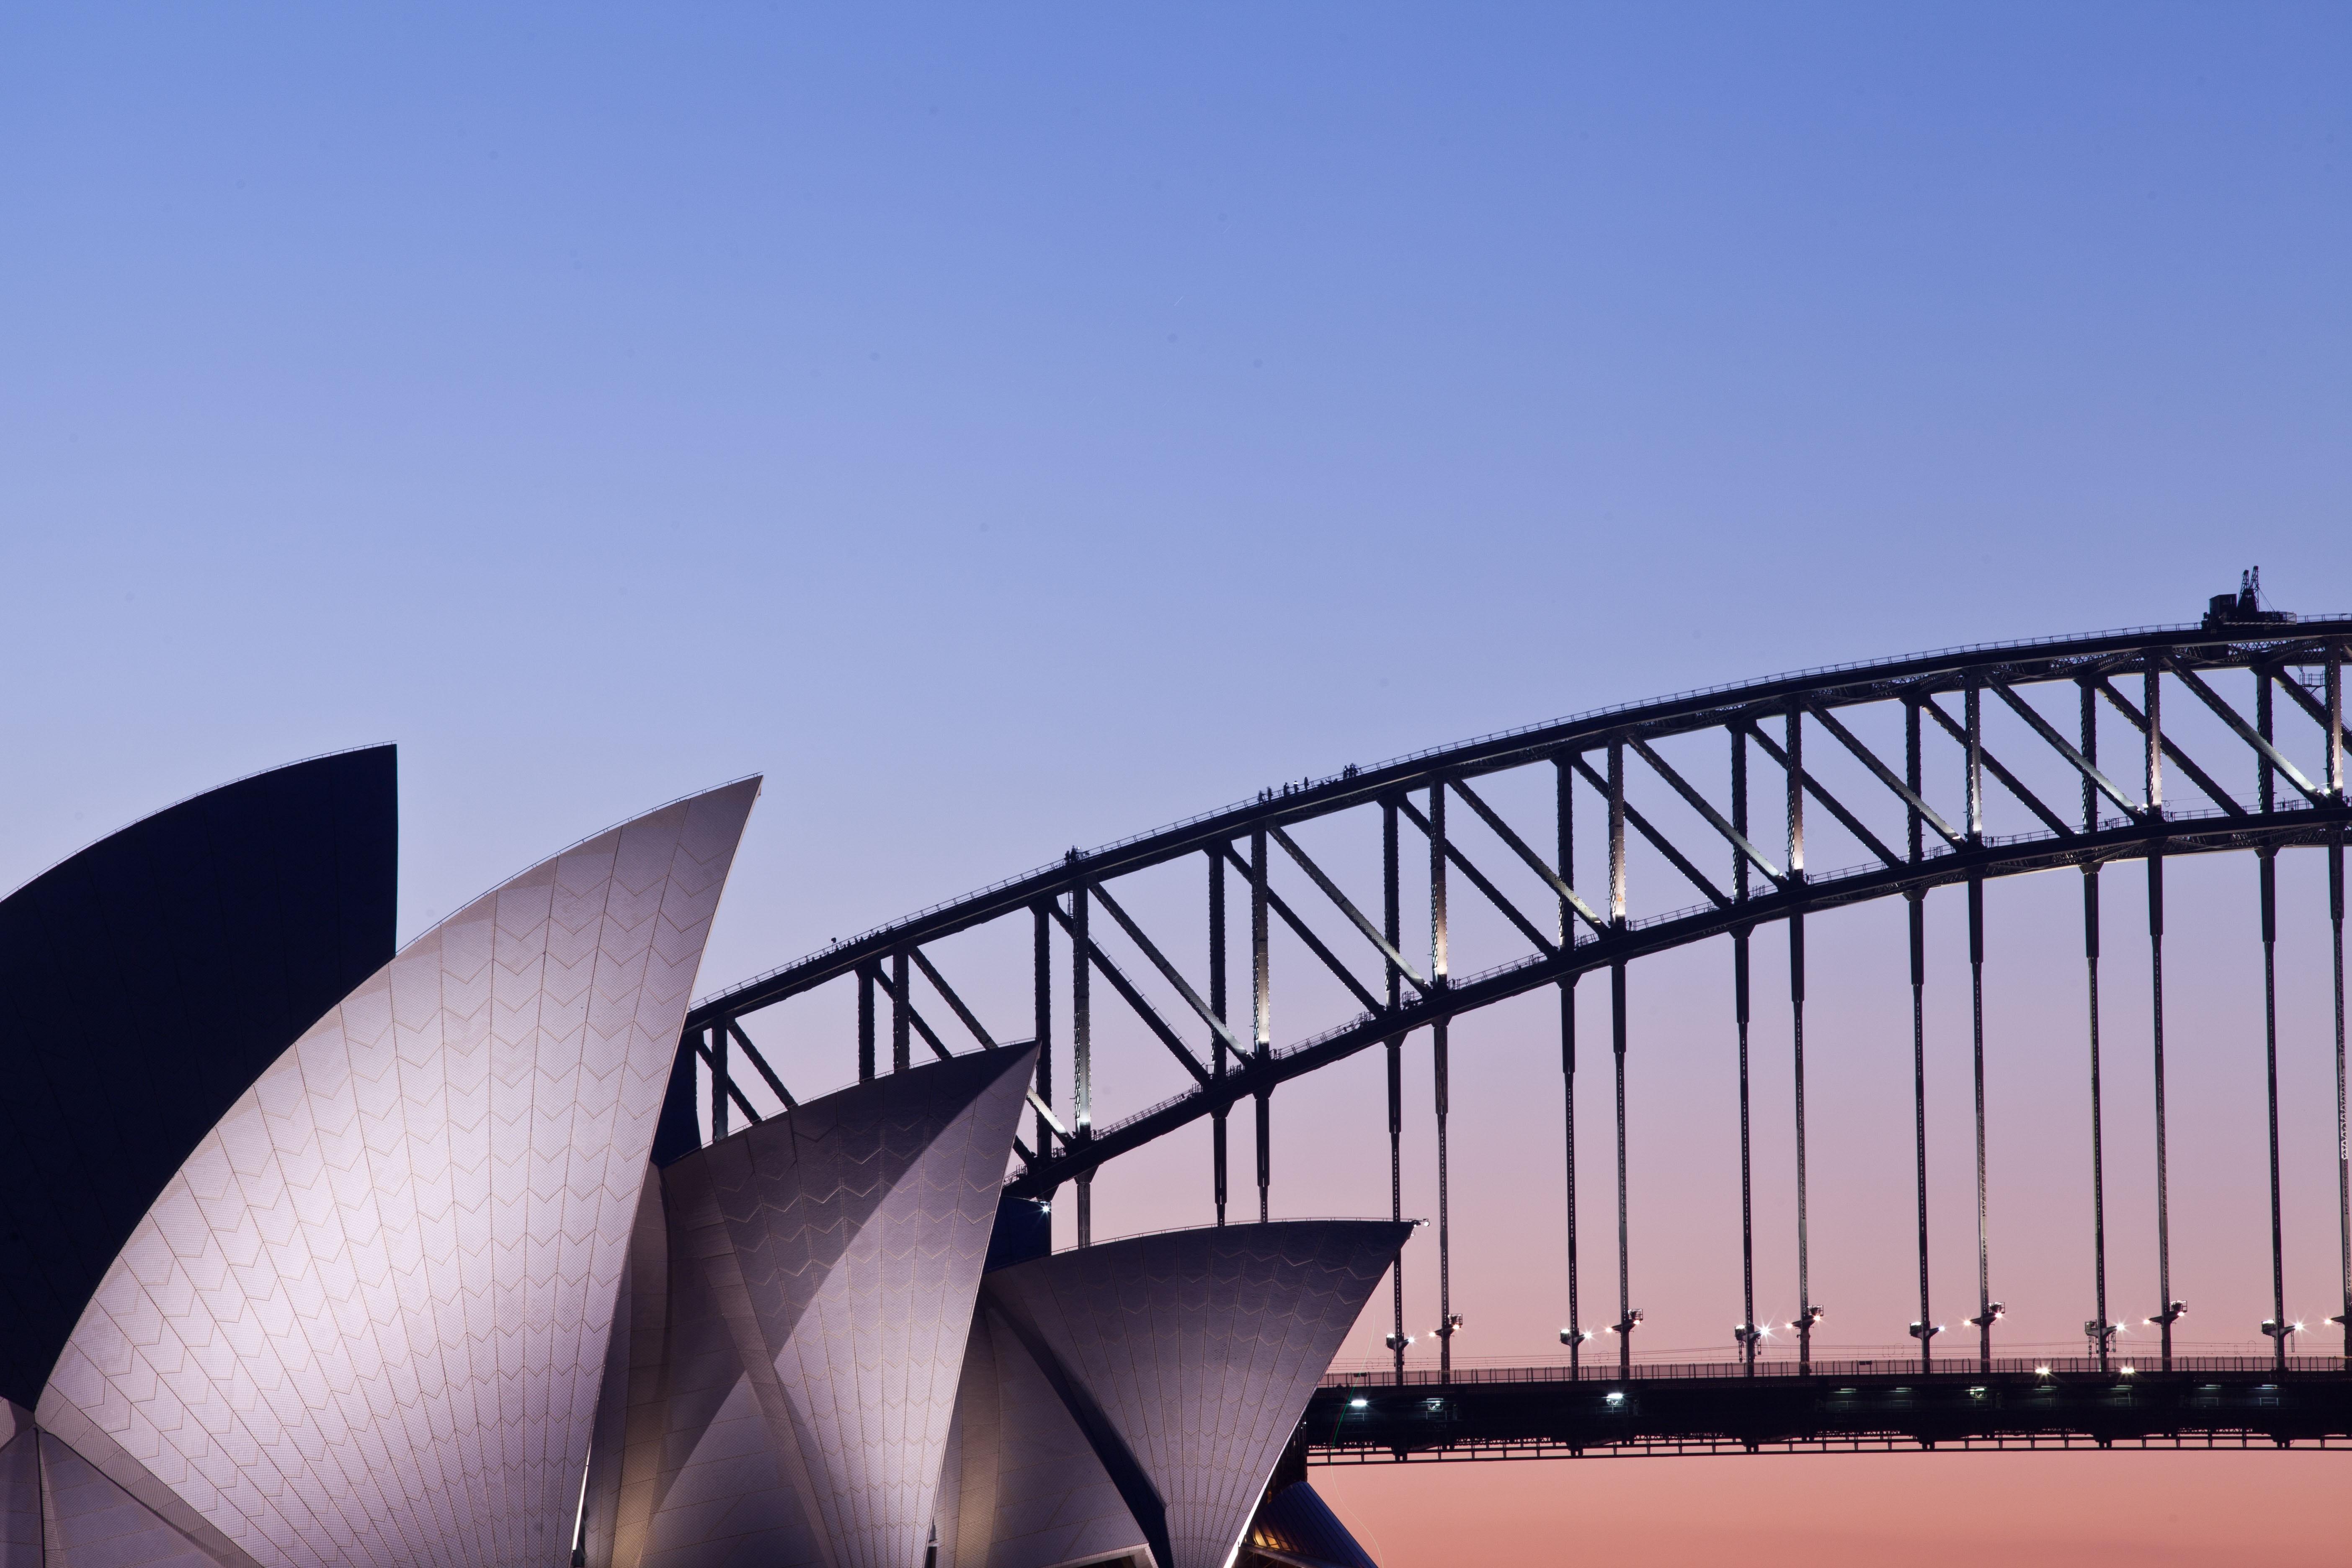 Sydney Harbour Bridge Climb Sydney   © Goeff Jones/Courtesy of Bridge Climb